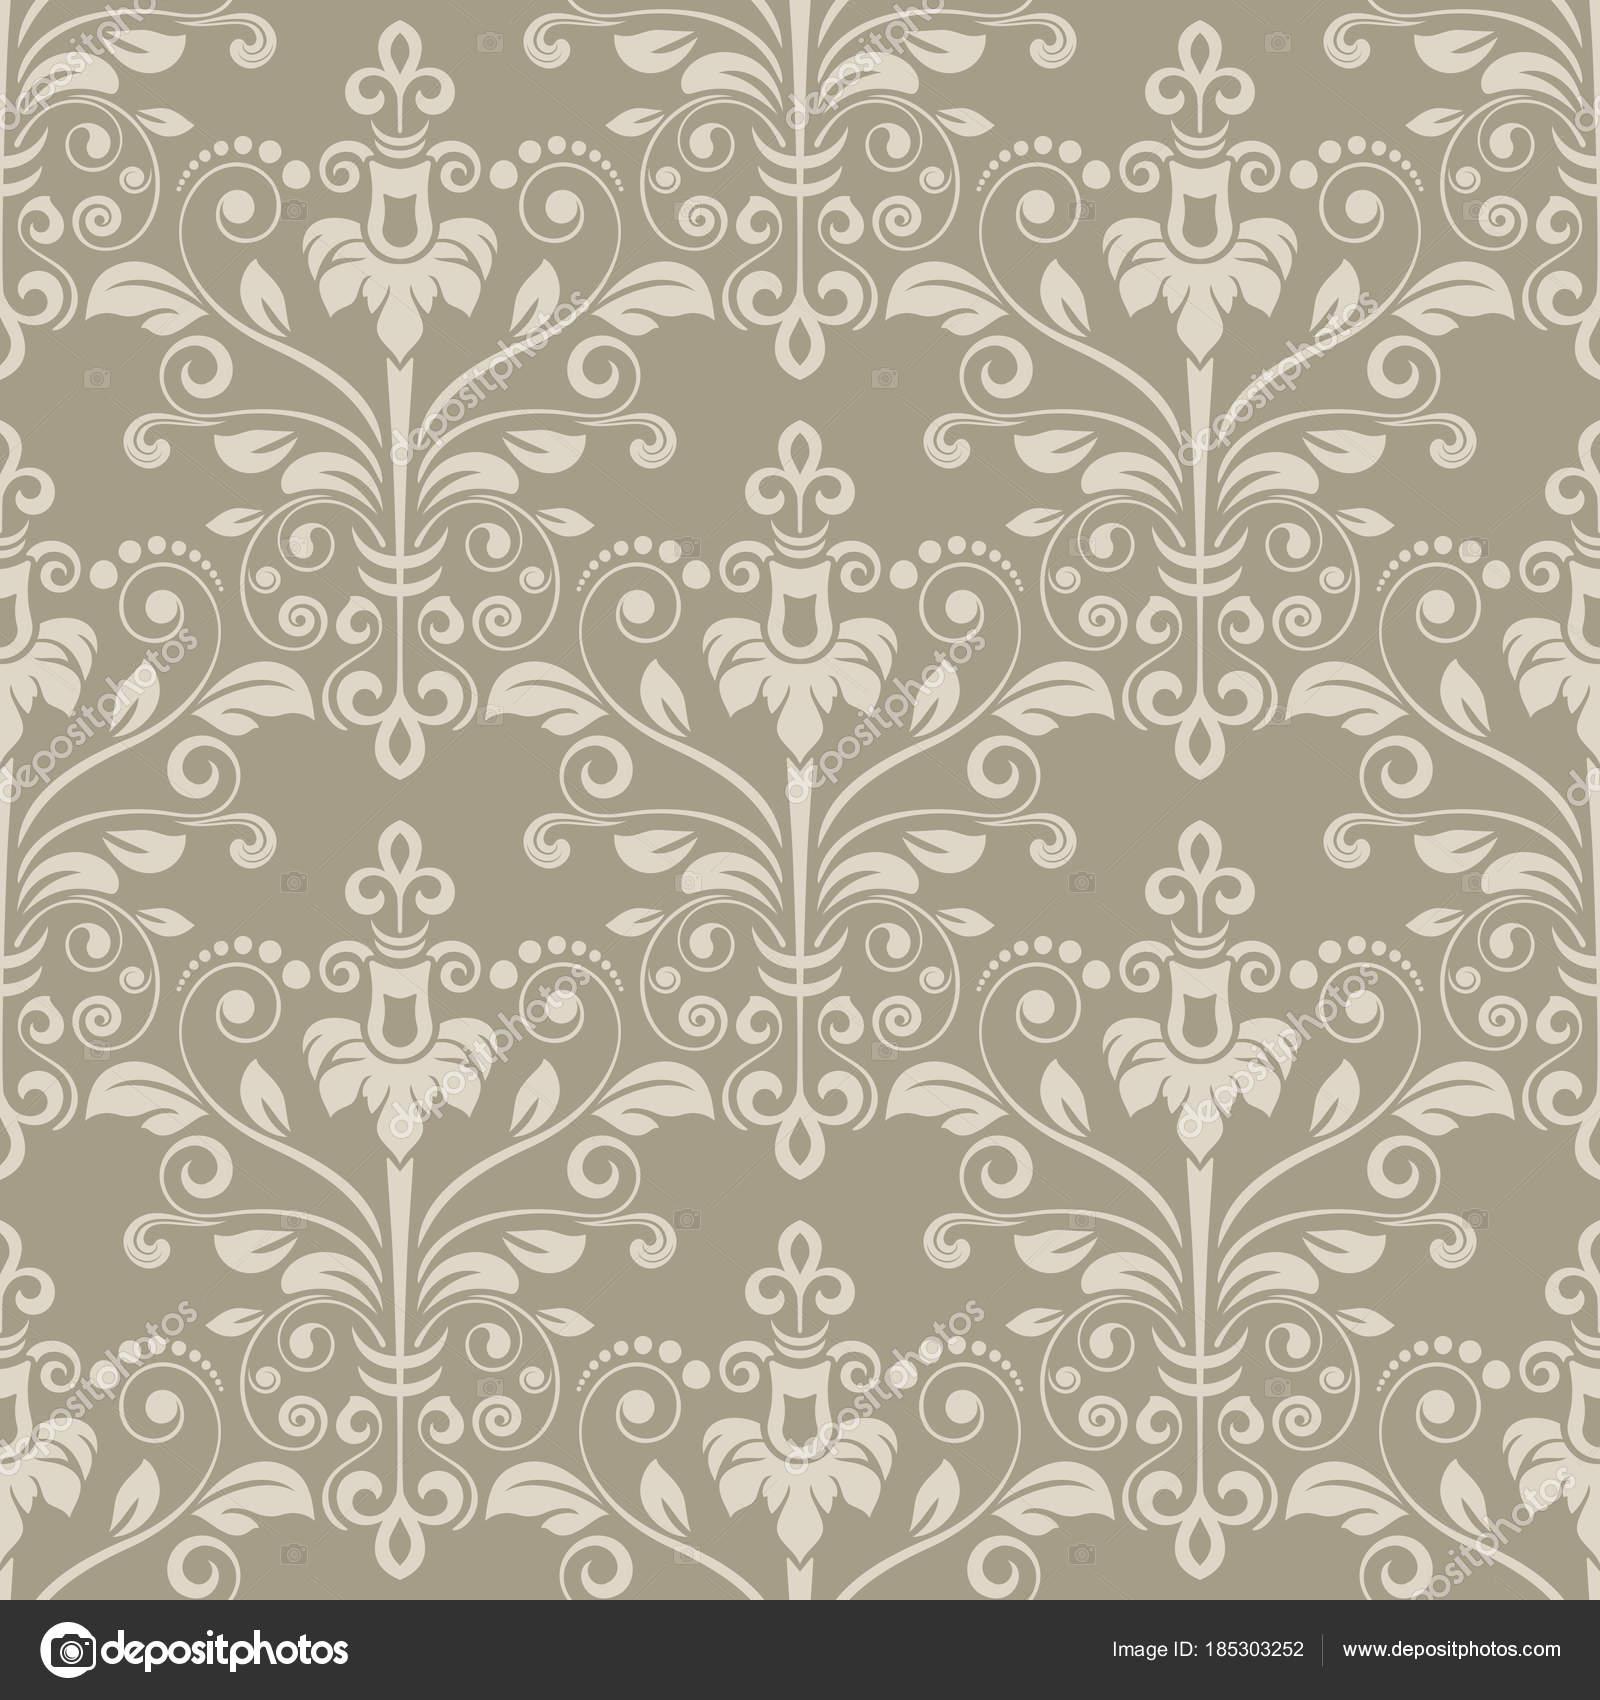 Vintage Beige Floral Wallpaper Stock Vector C Lenapix 185303252